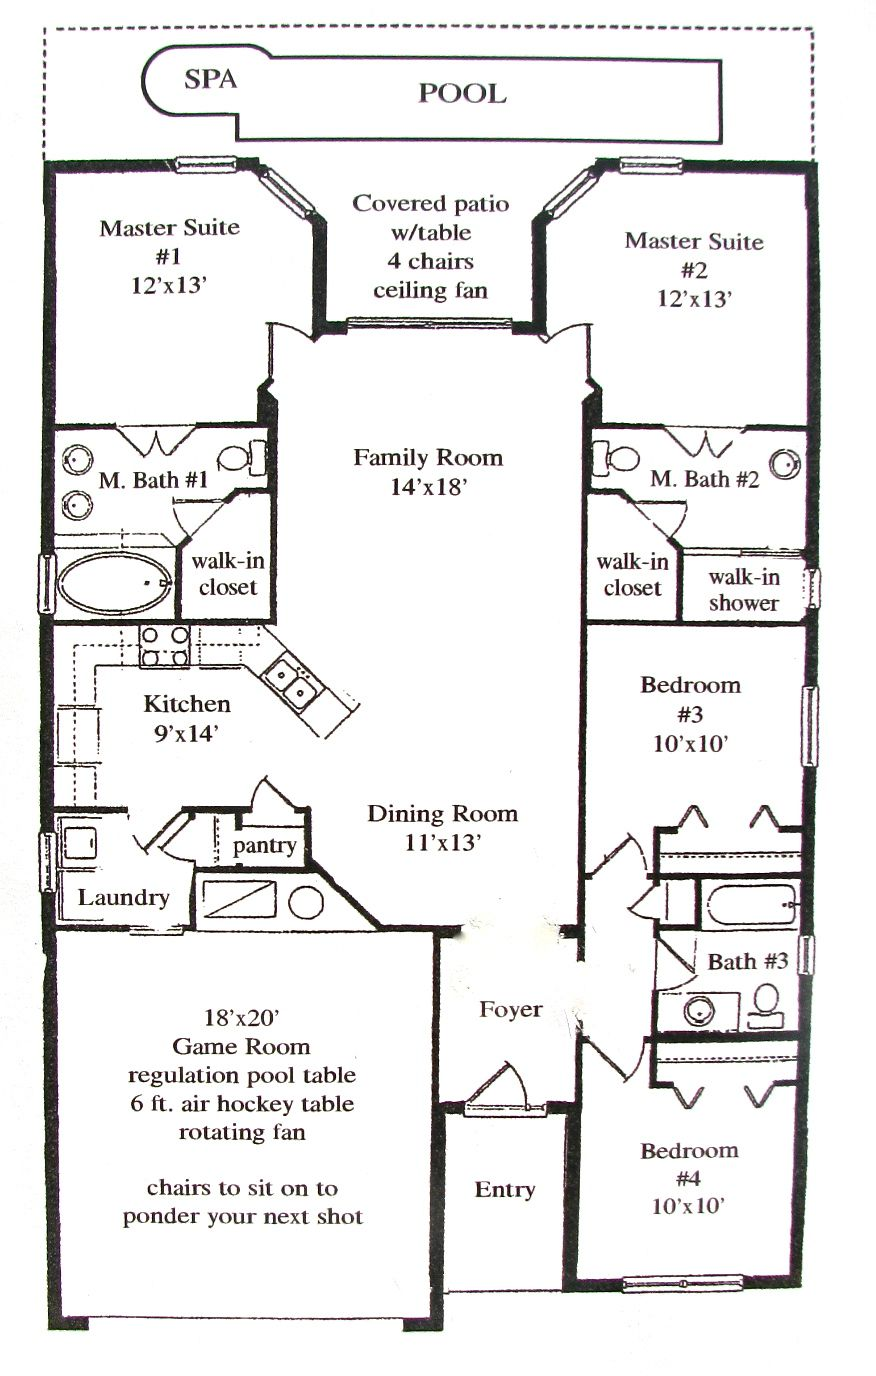 235 Villa Floor Plan 4285 Jpg 876 1376 Roman House Roman Villa Floor Plans